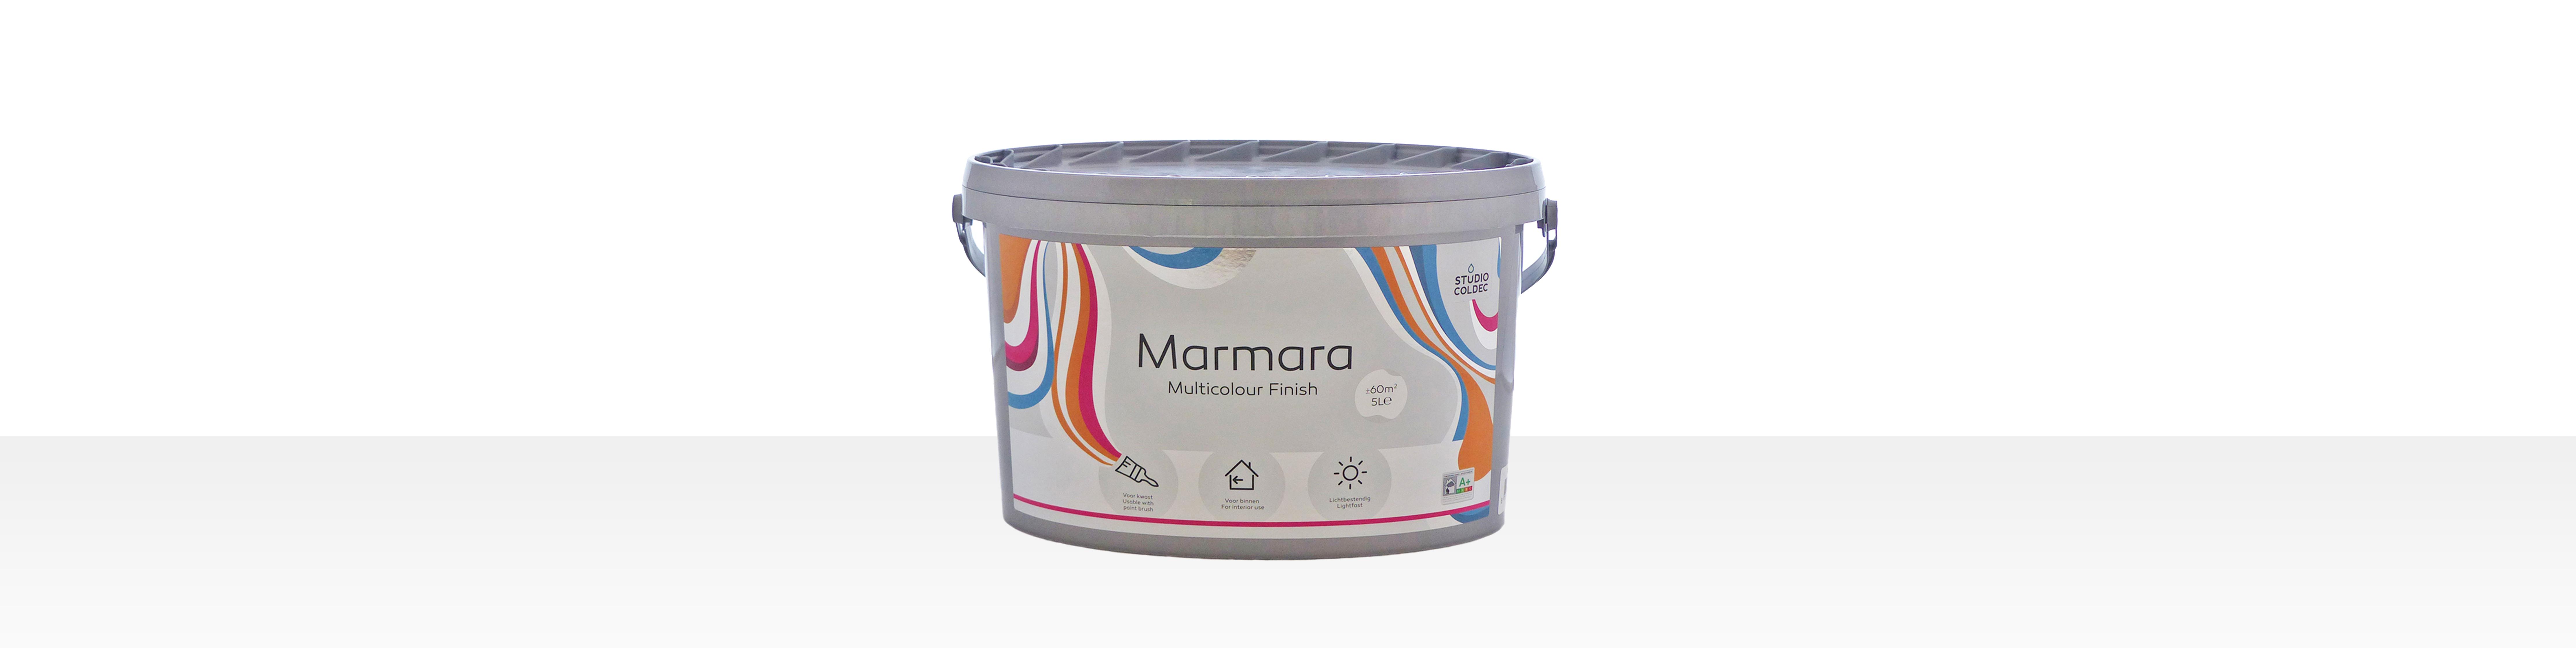 marmara-producten